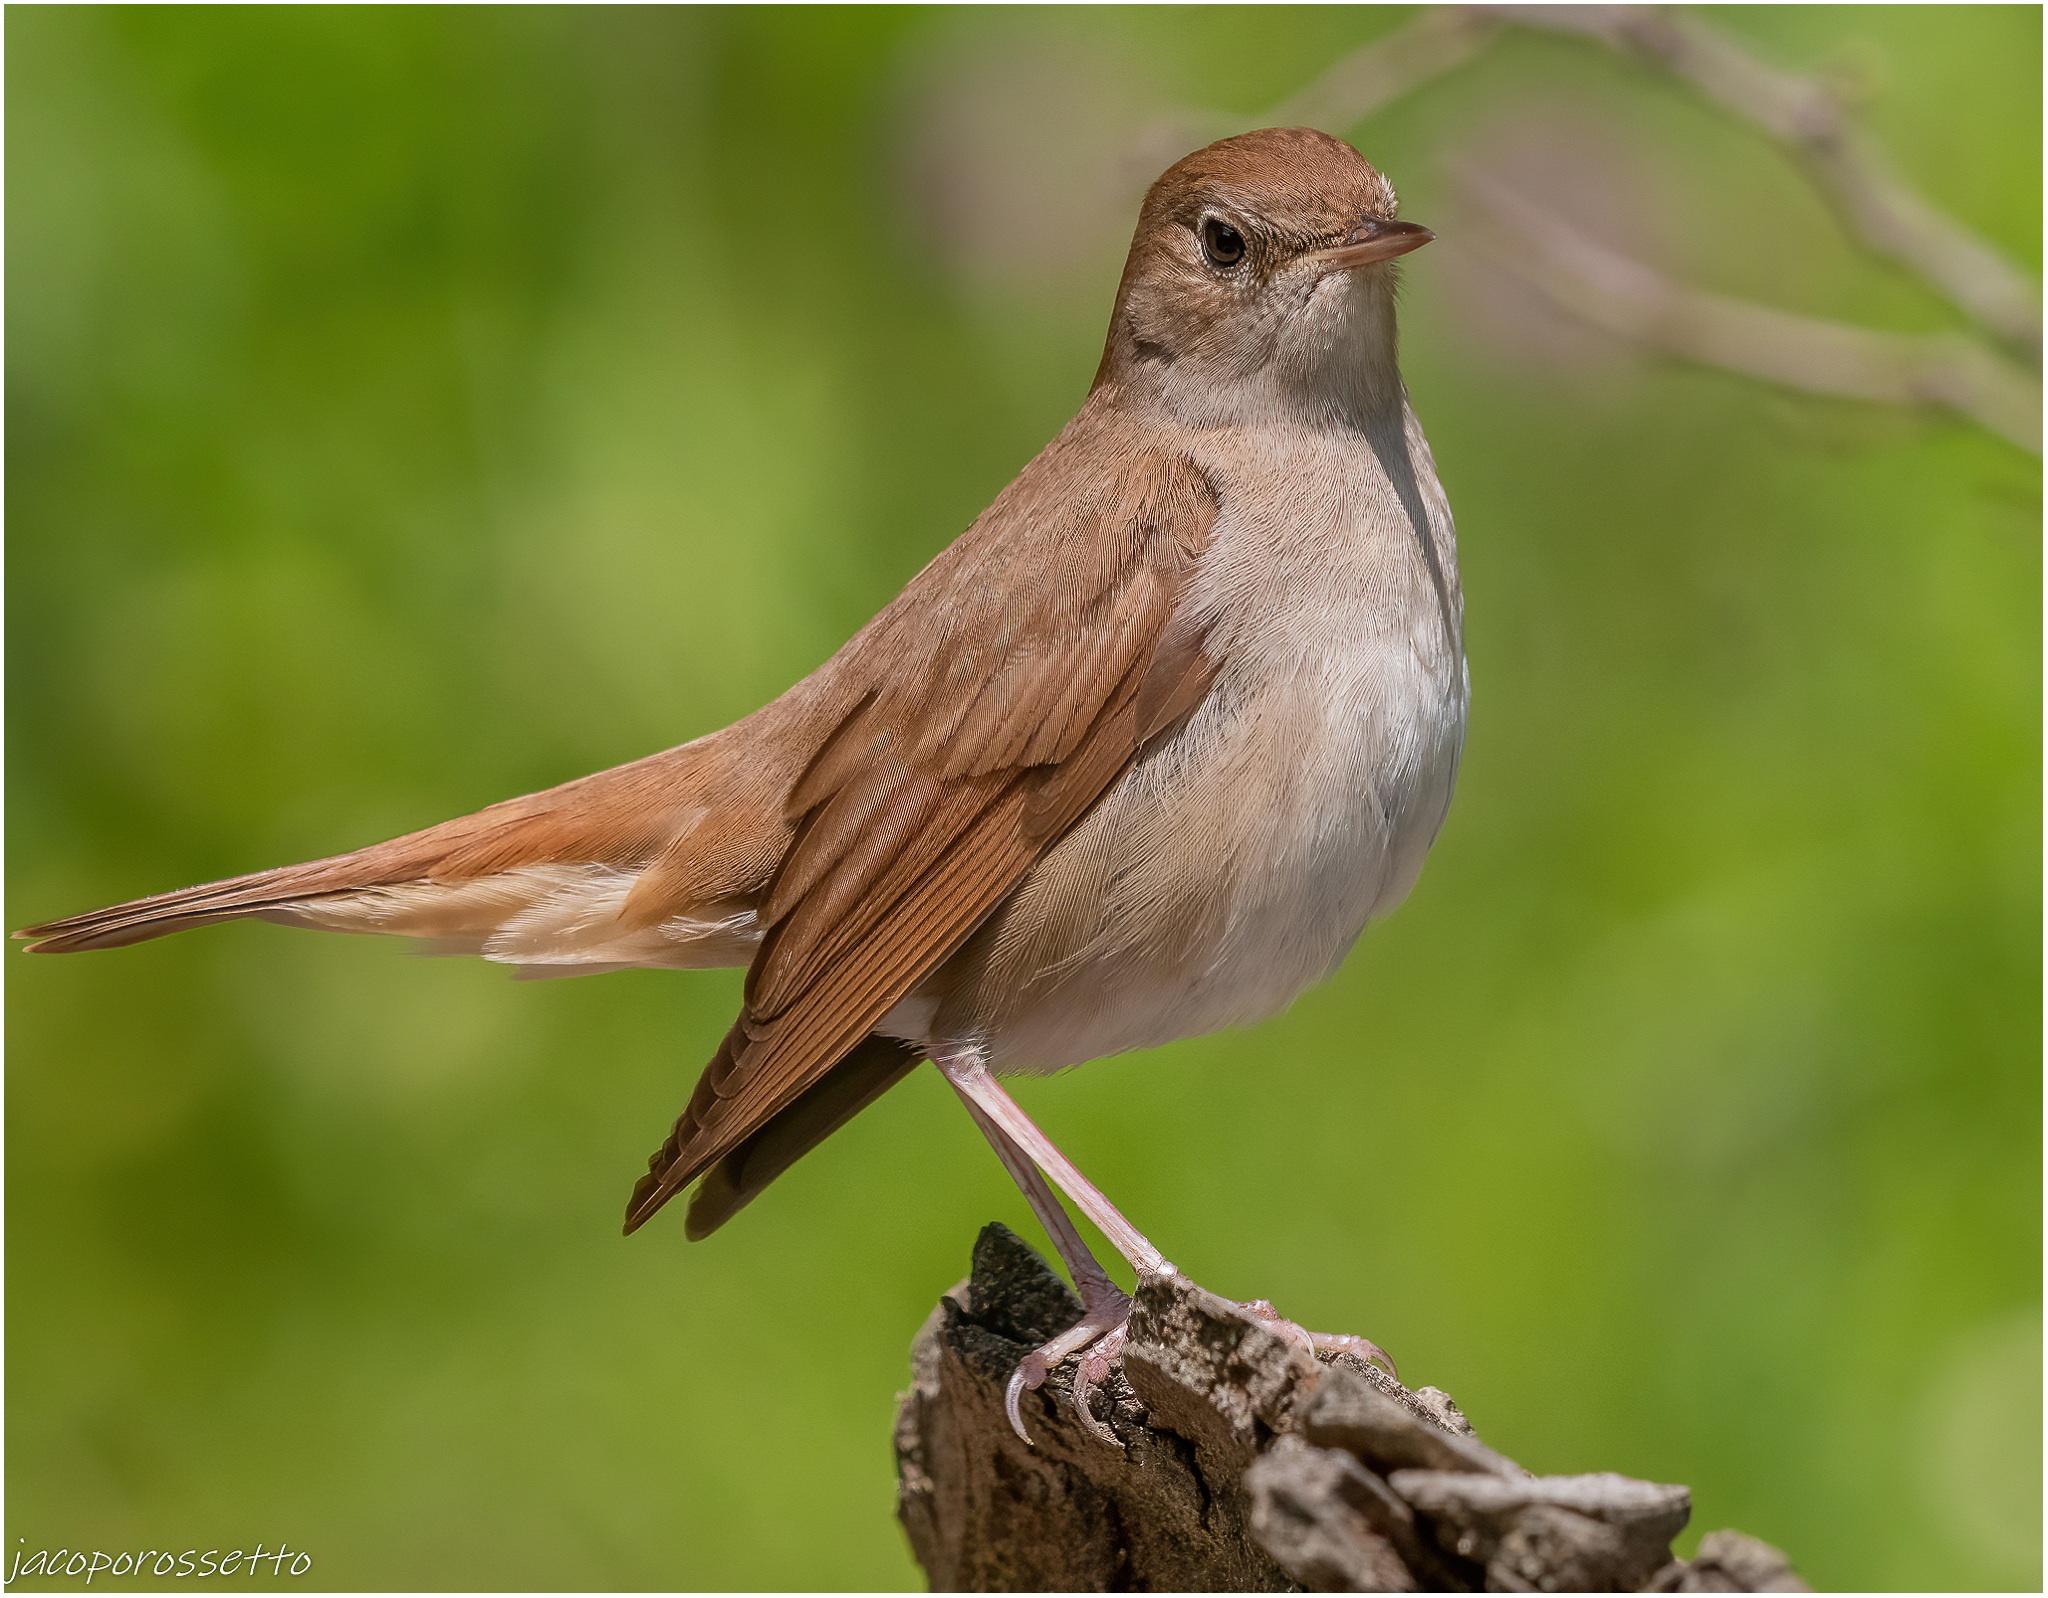 Nightingale ...